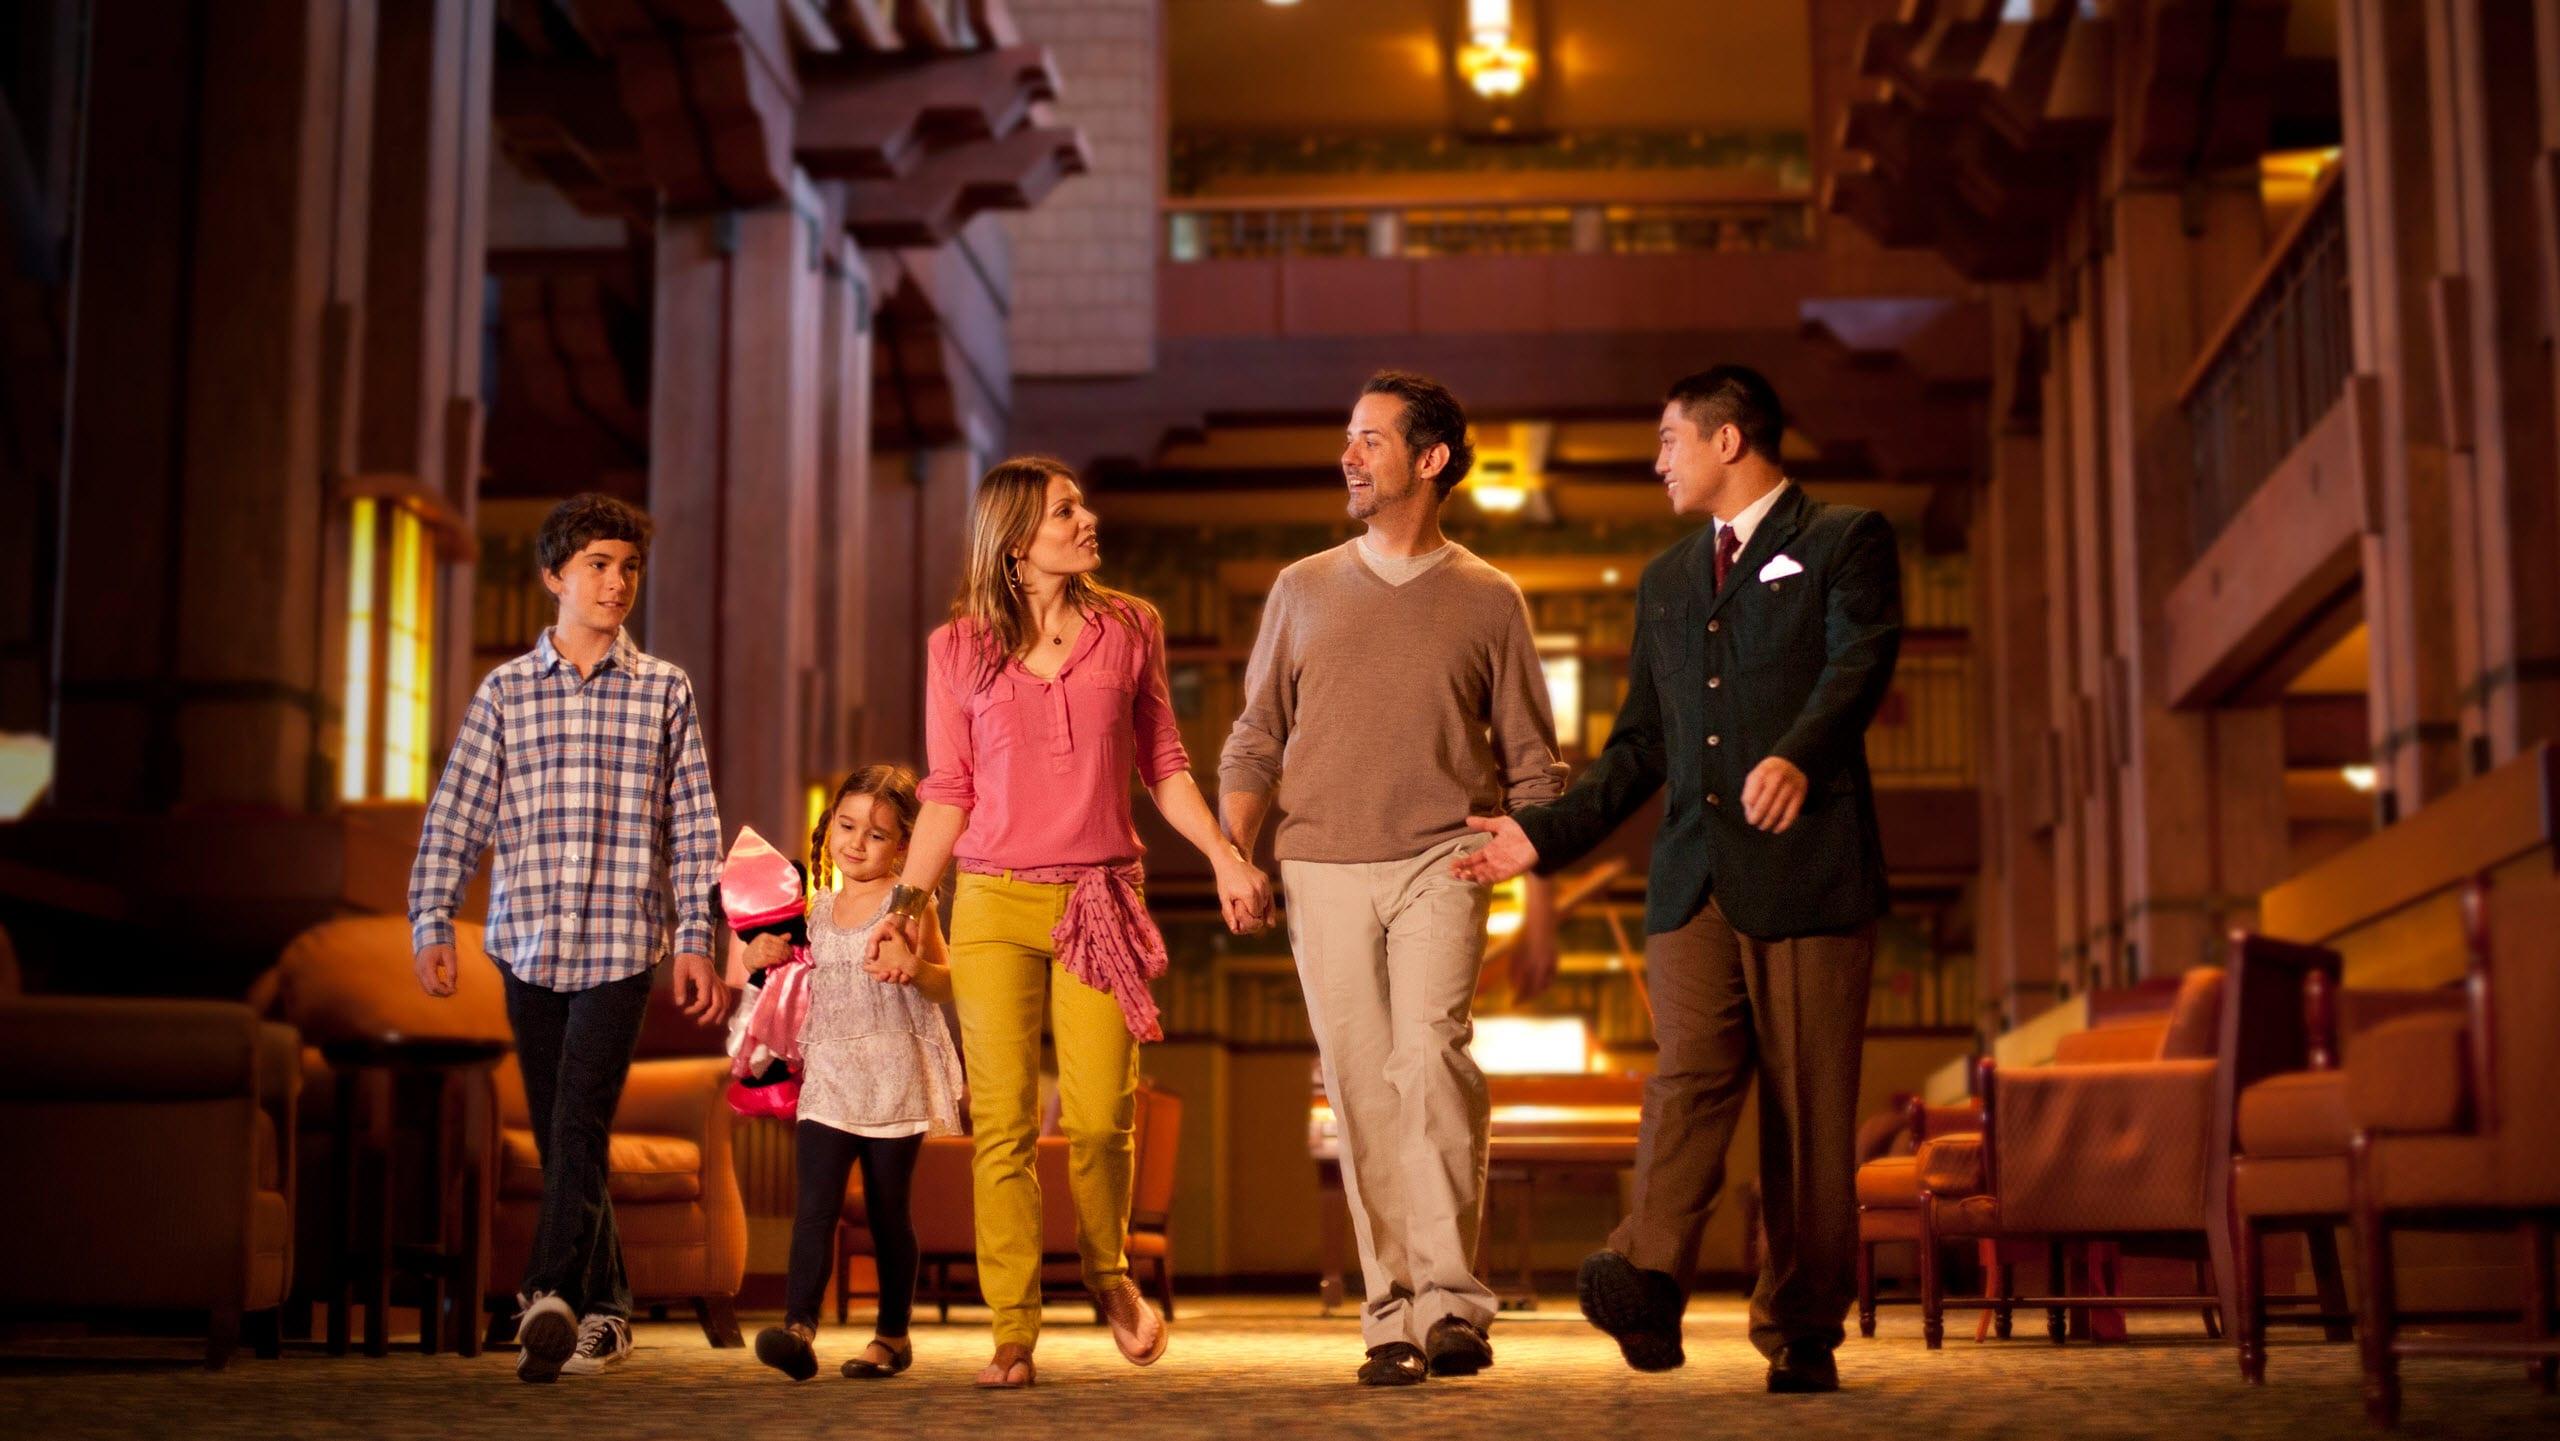 A Disney Cast Member leads a family of 4 through a hotel lobby